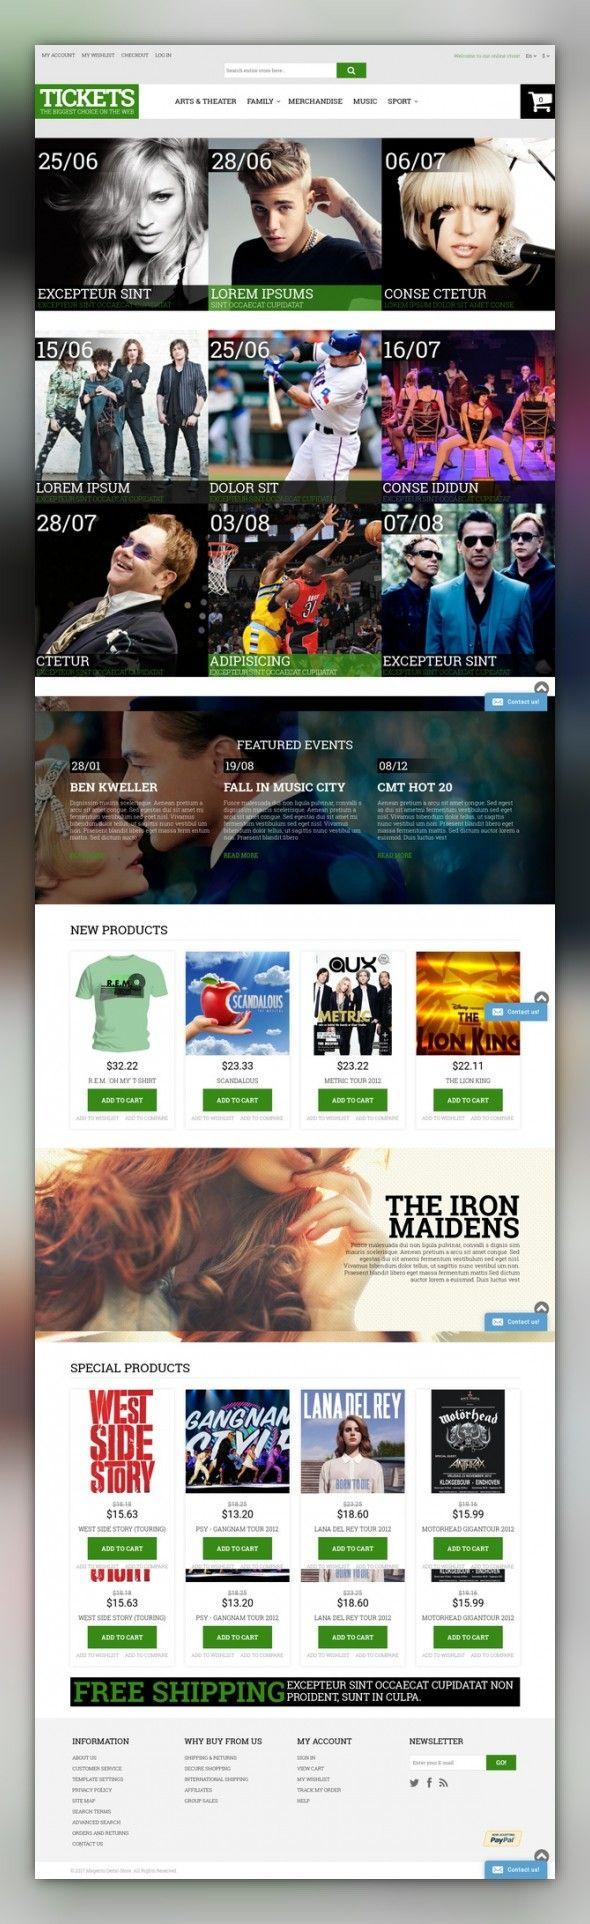 Music Ticket Broker Magento Theme E-commerce Templates, Magento Themes, Entertainment, Games & Nightlife, Entertainment Templates, Tickets Website Templates